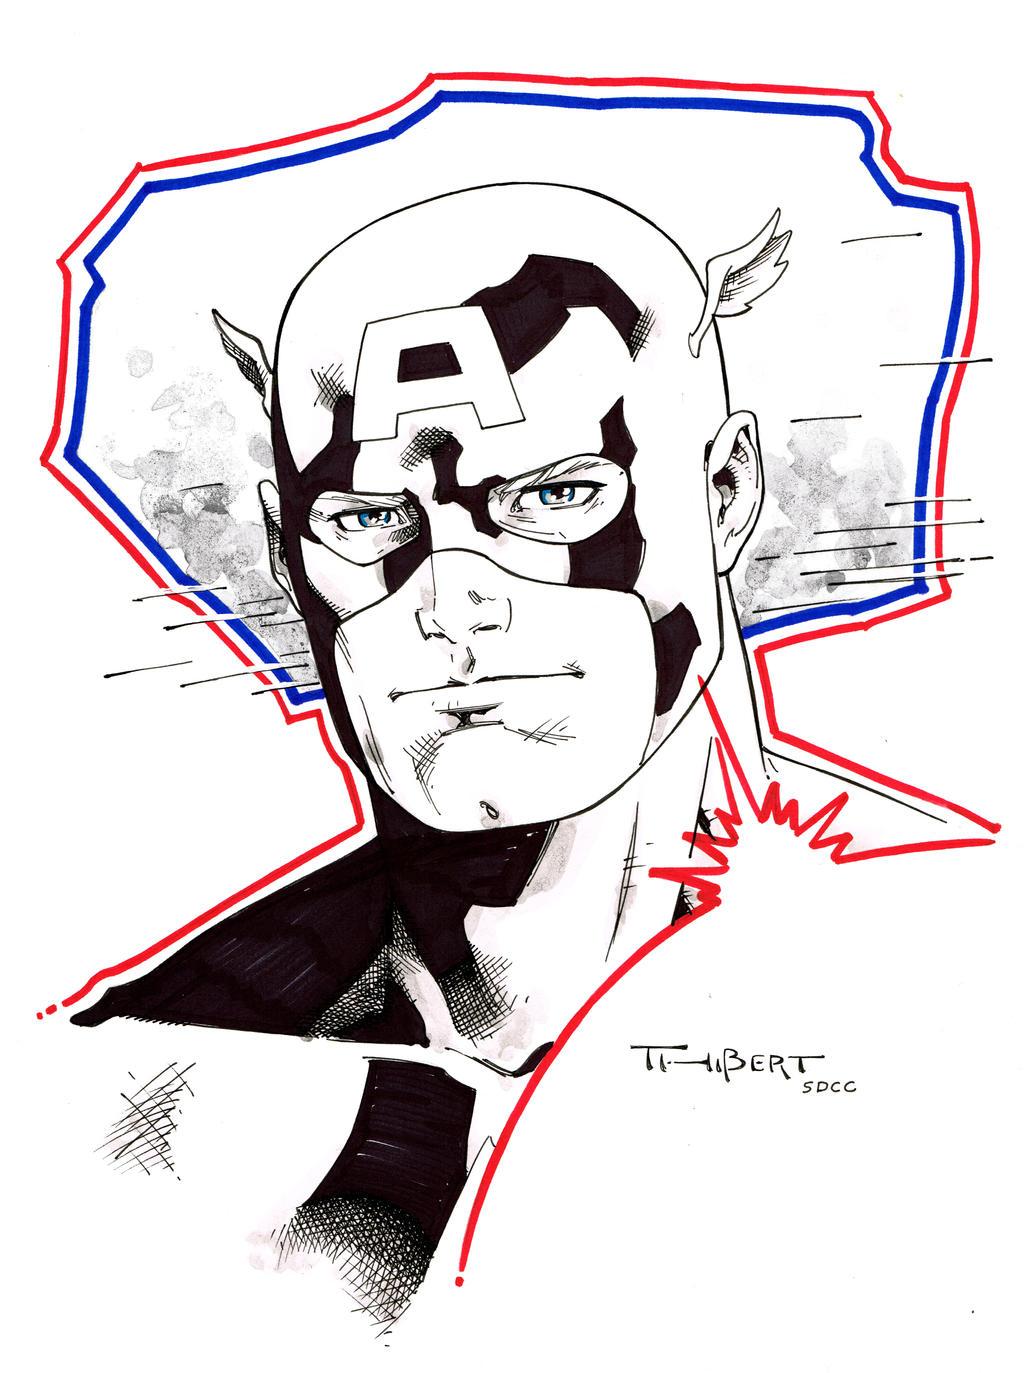 Captain America doodle - SDCC 2014 by aethibert